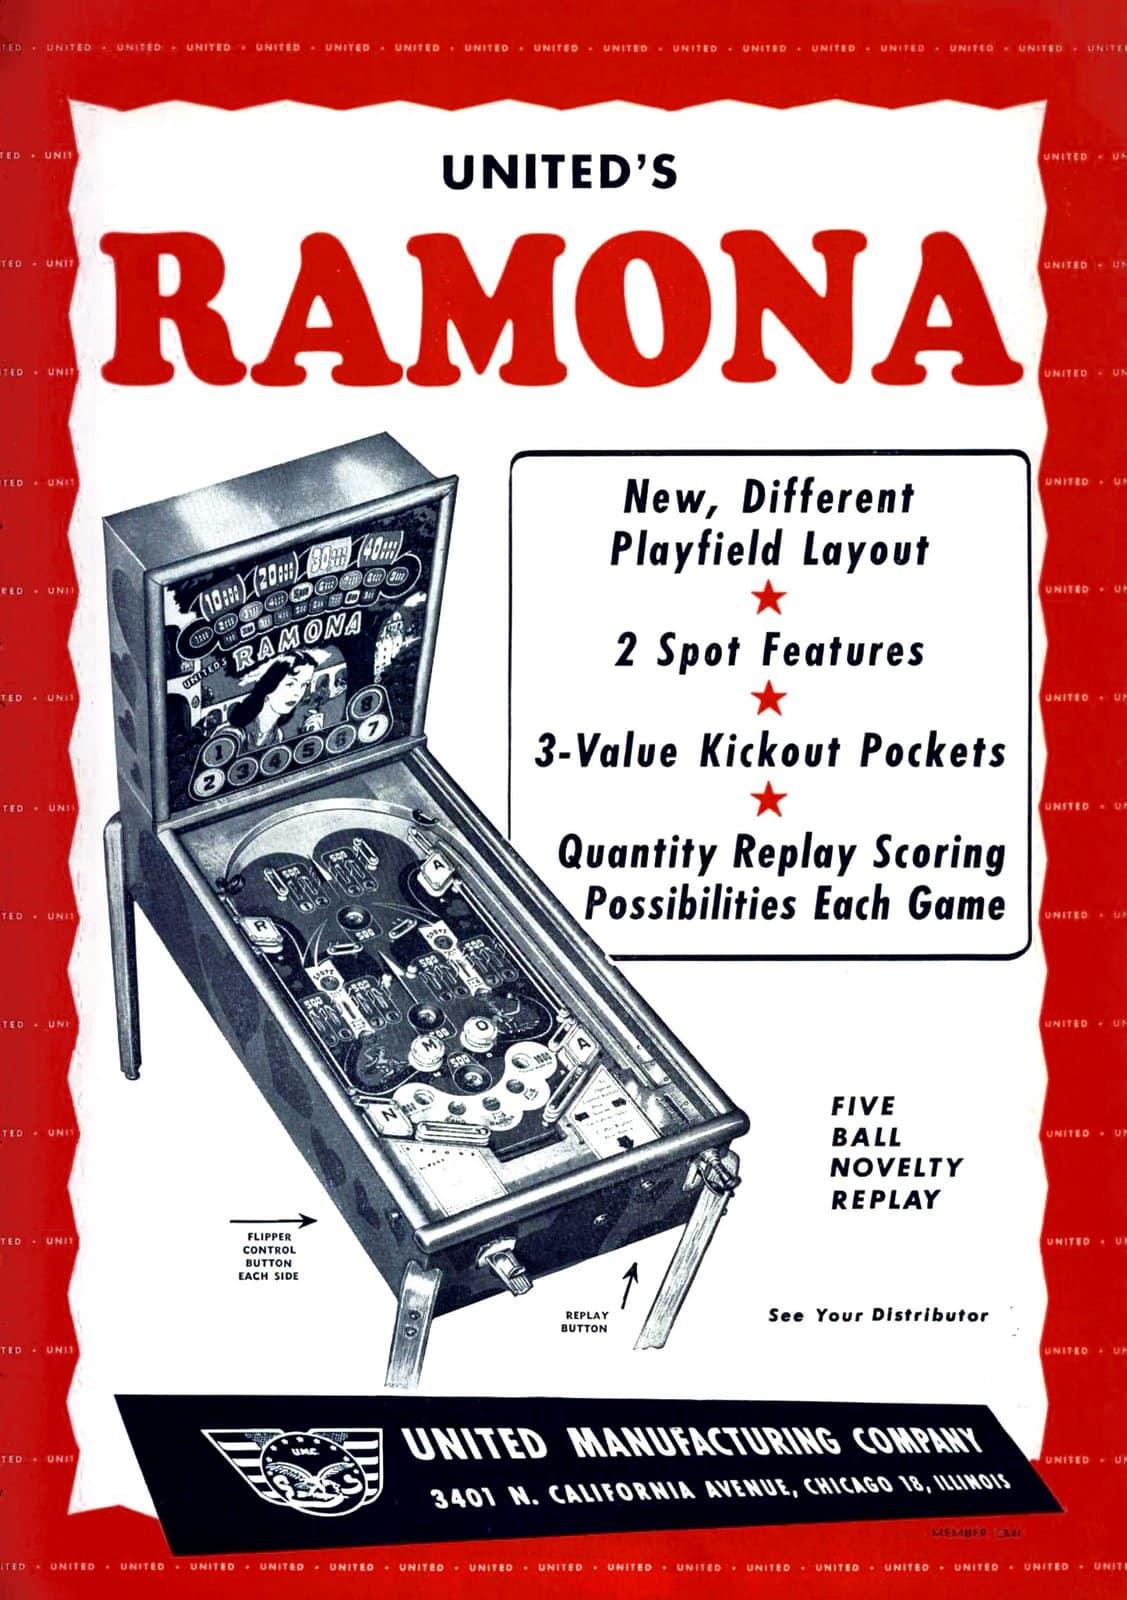 United's Ramona vintage pinball game (1949)